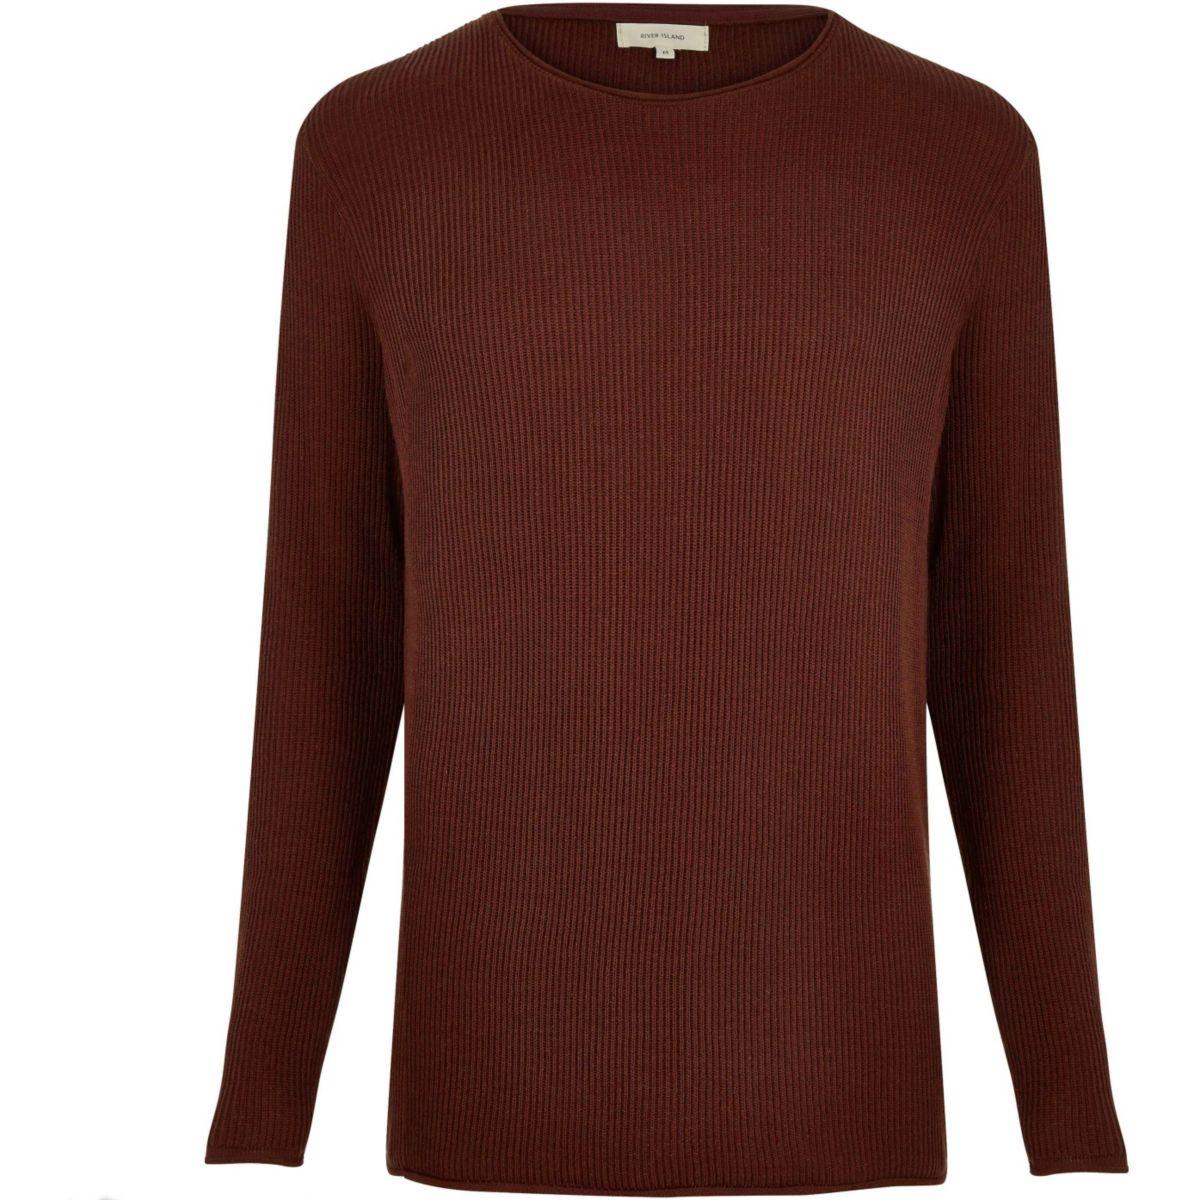 Rust brown lightweight plaited tunic jumper